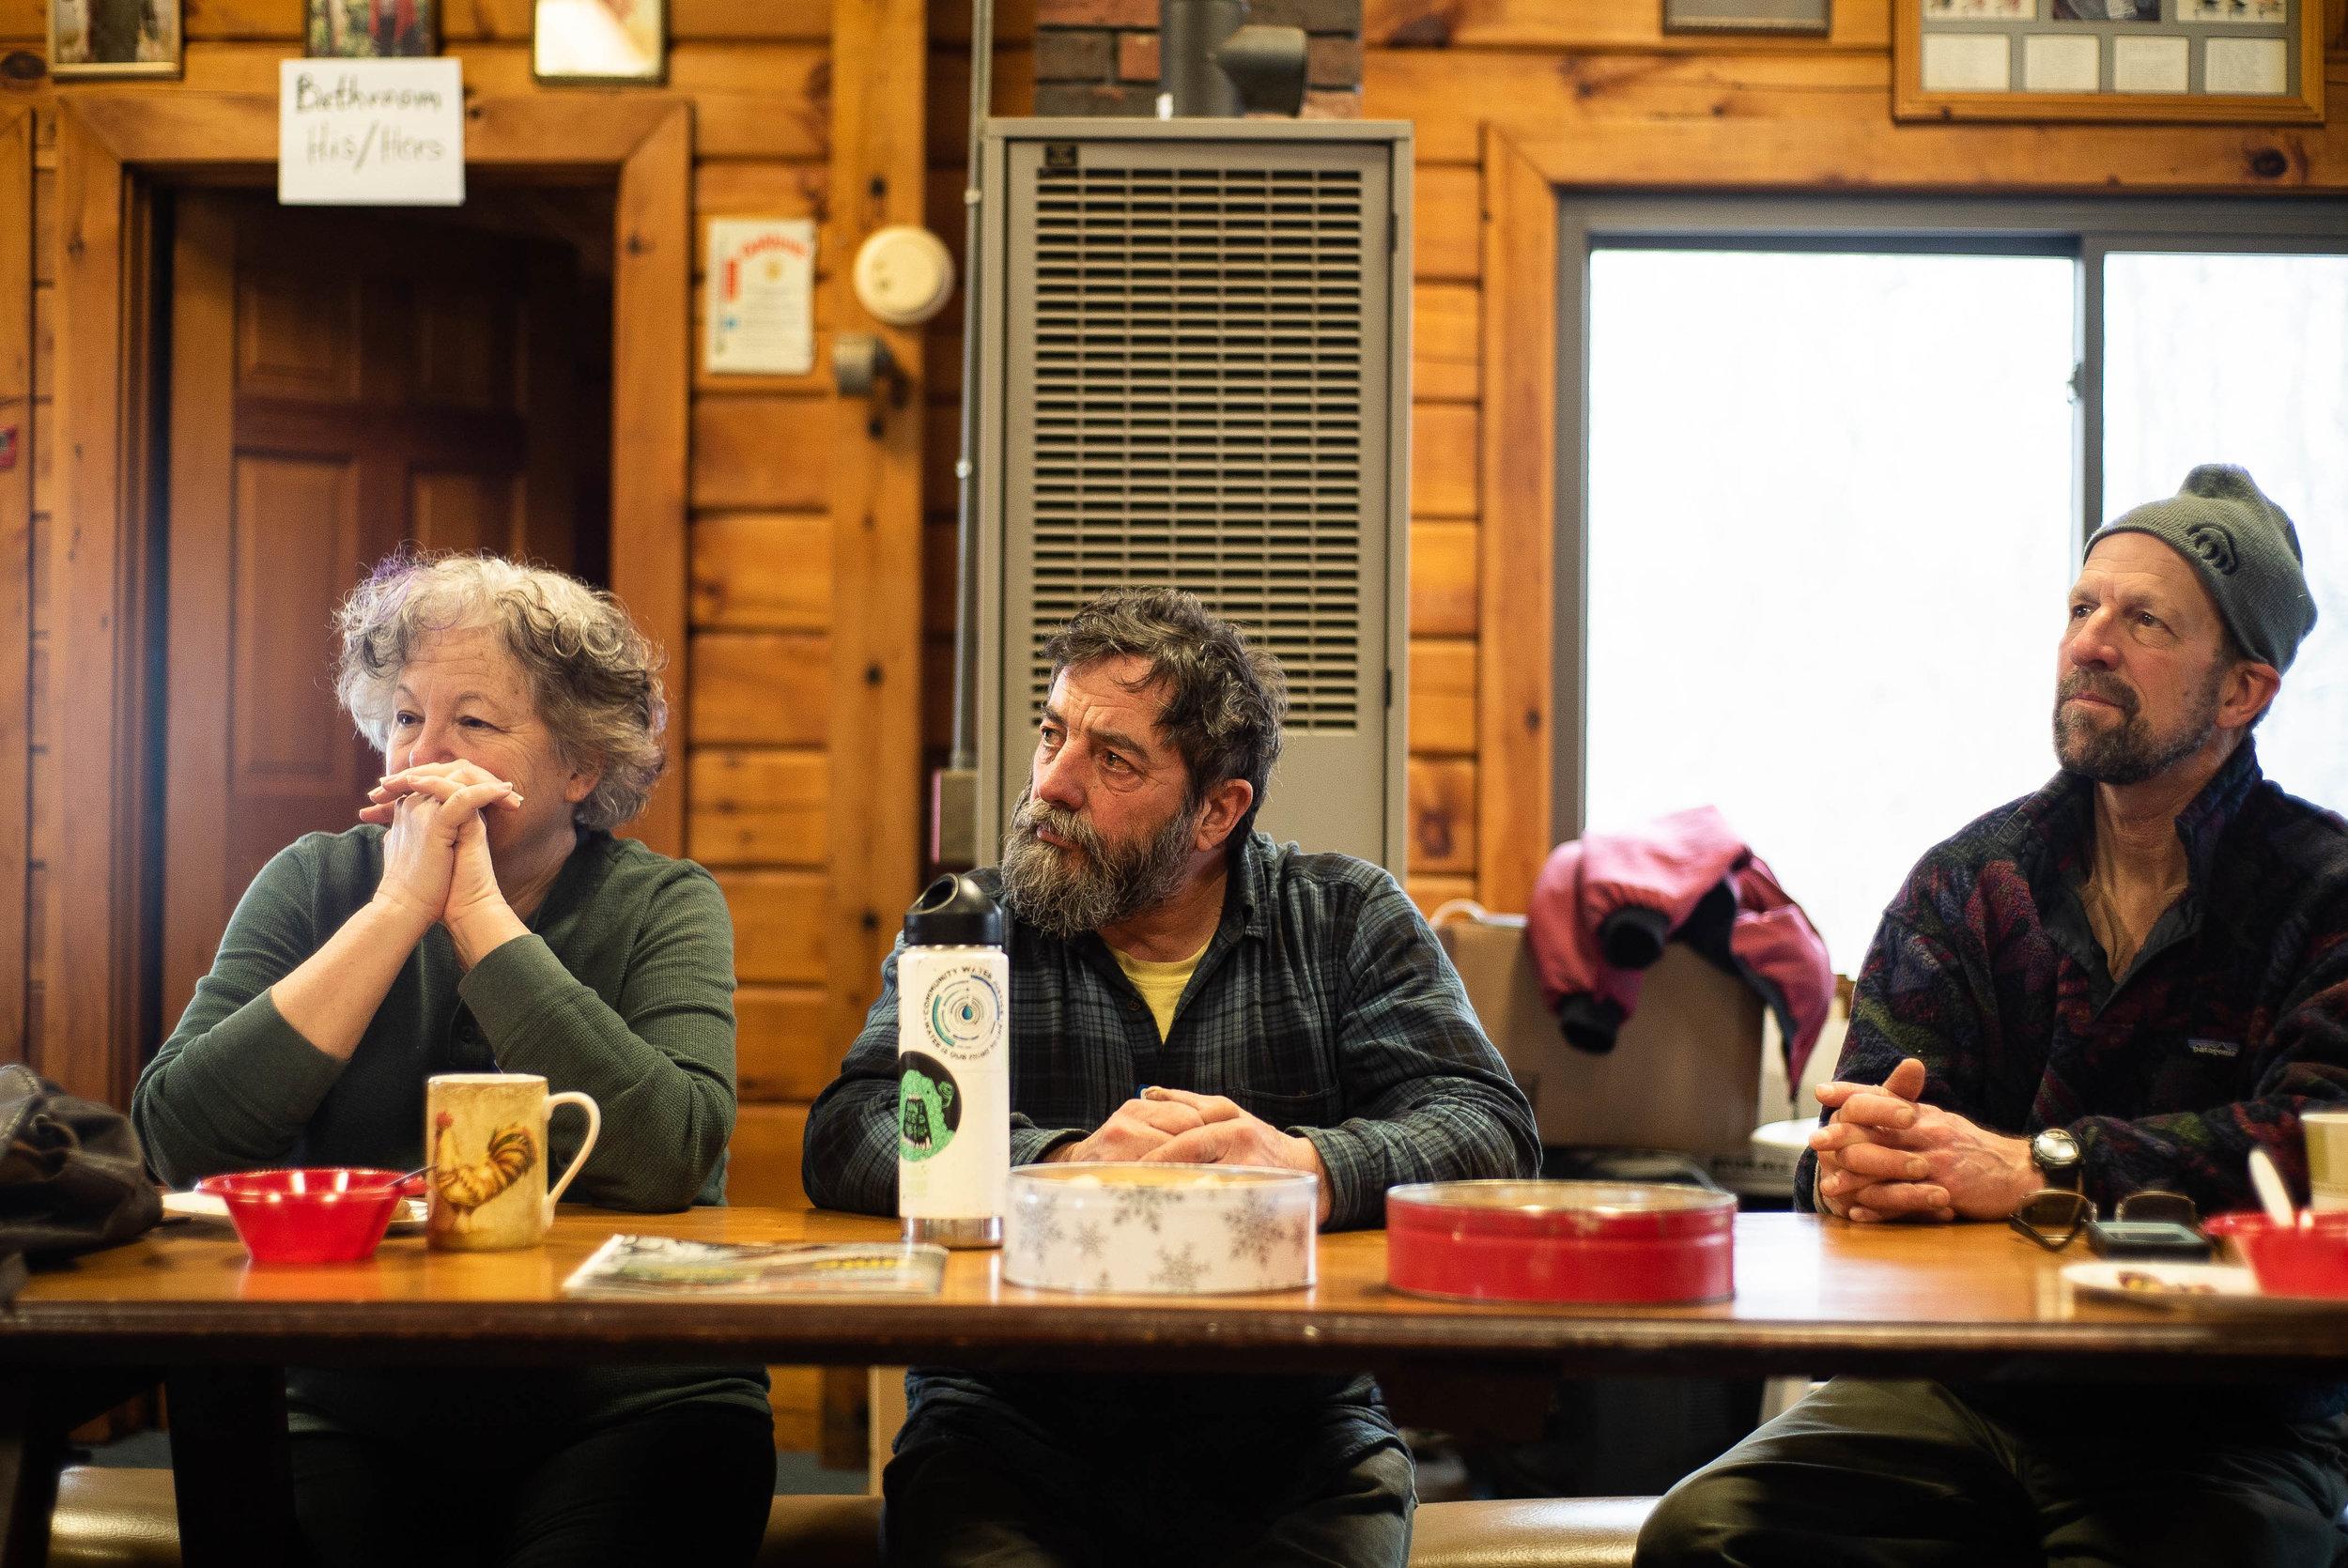 Joyce Green, Peter Crockett, Clayton Cole actively listening during the PRPT Annual Meeting. Photo: Chris Battaglia